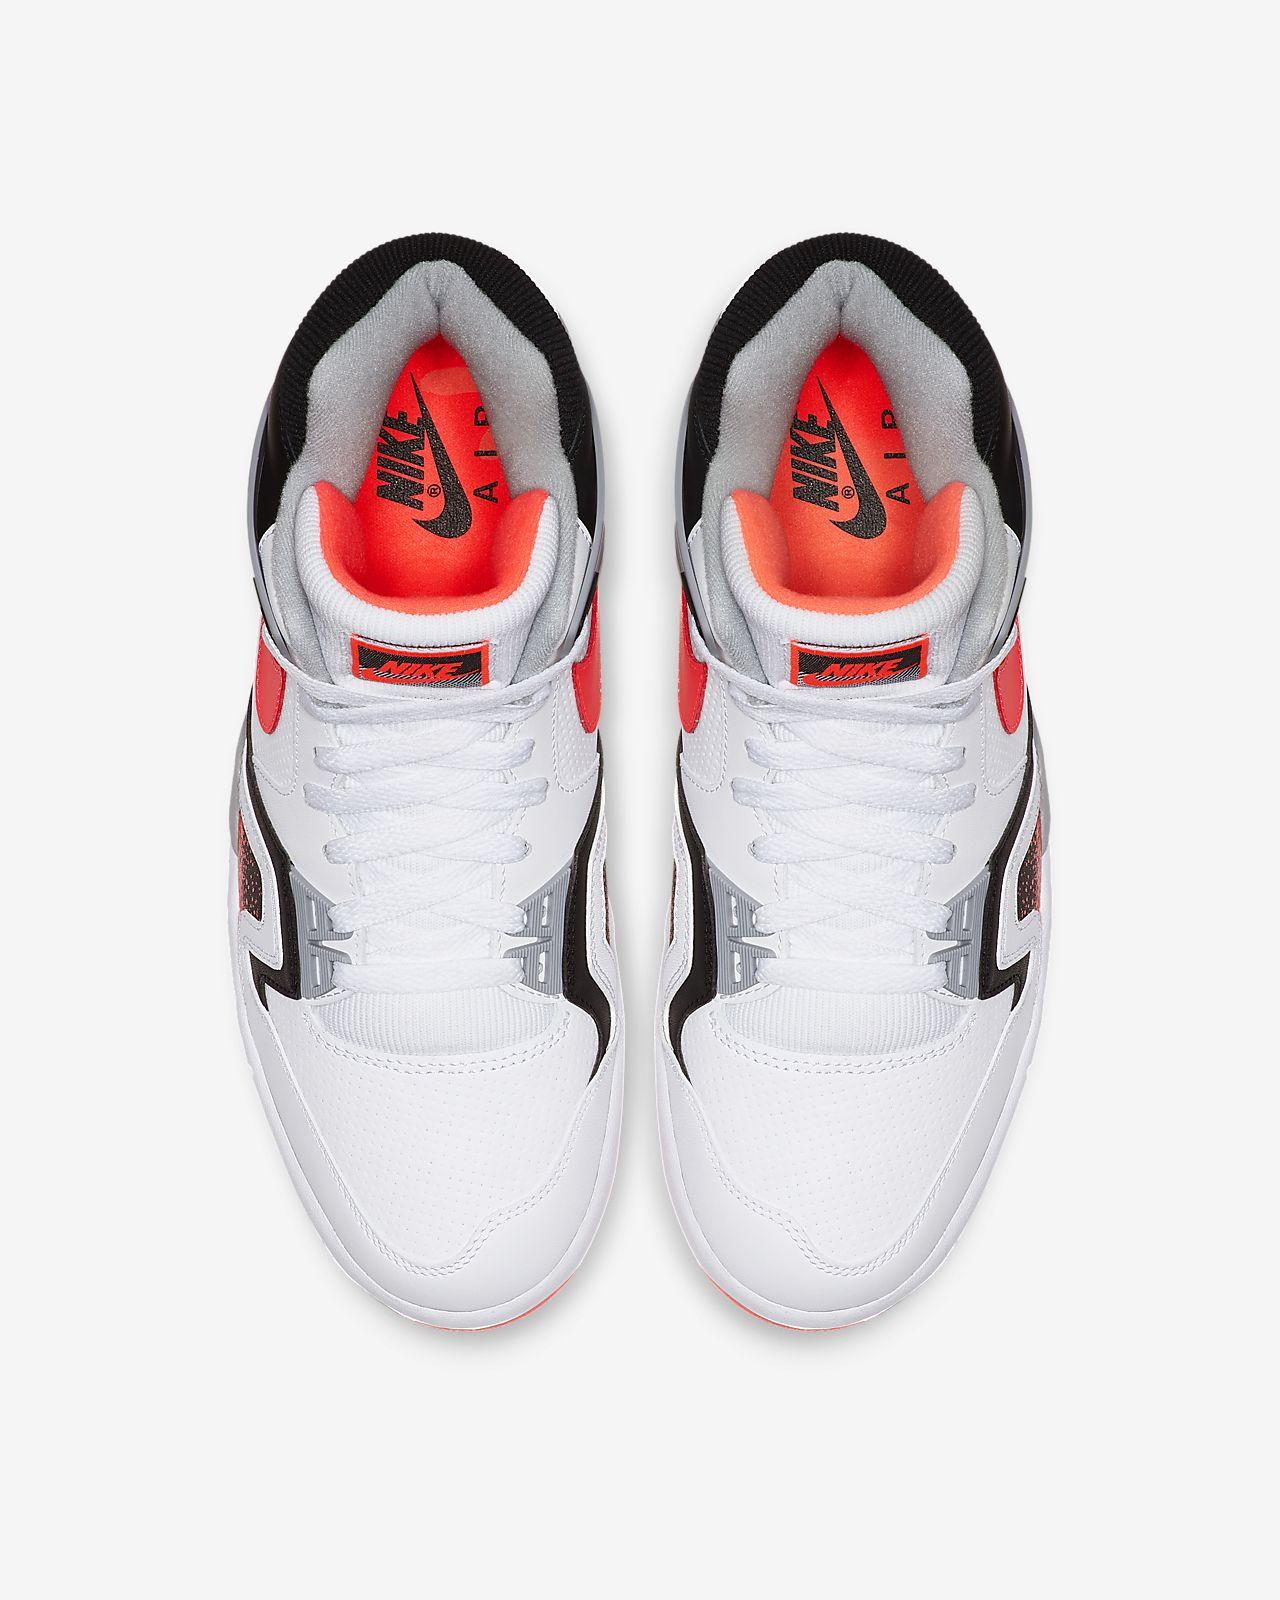 Nike Qs 2 Challenge Herenschoen84046ce80ec9747bcc8f141d18cc3266 Air Tech qUMVSpz